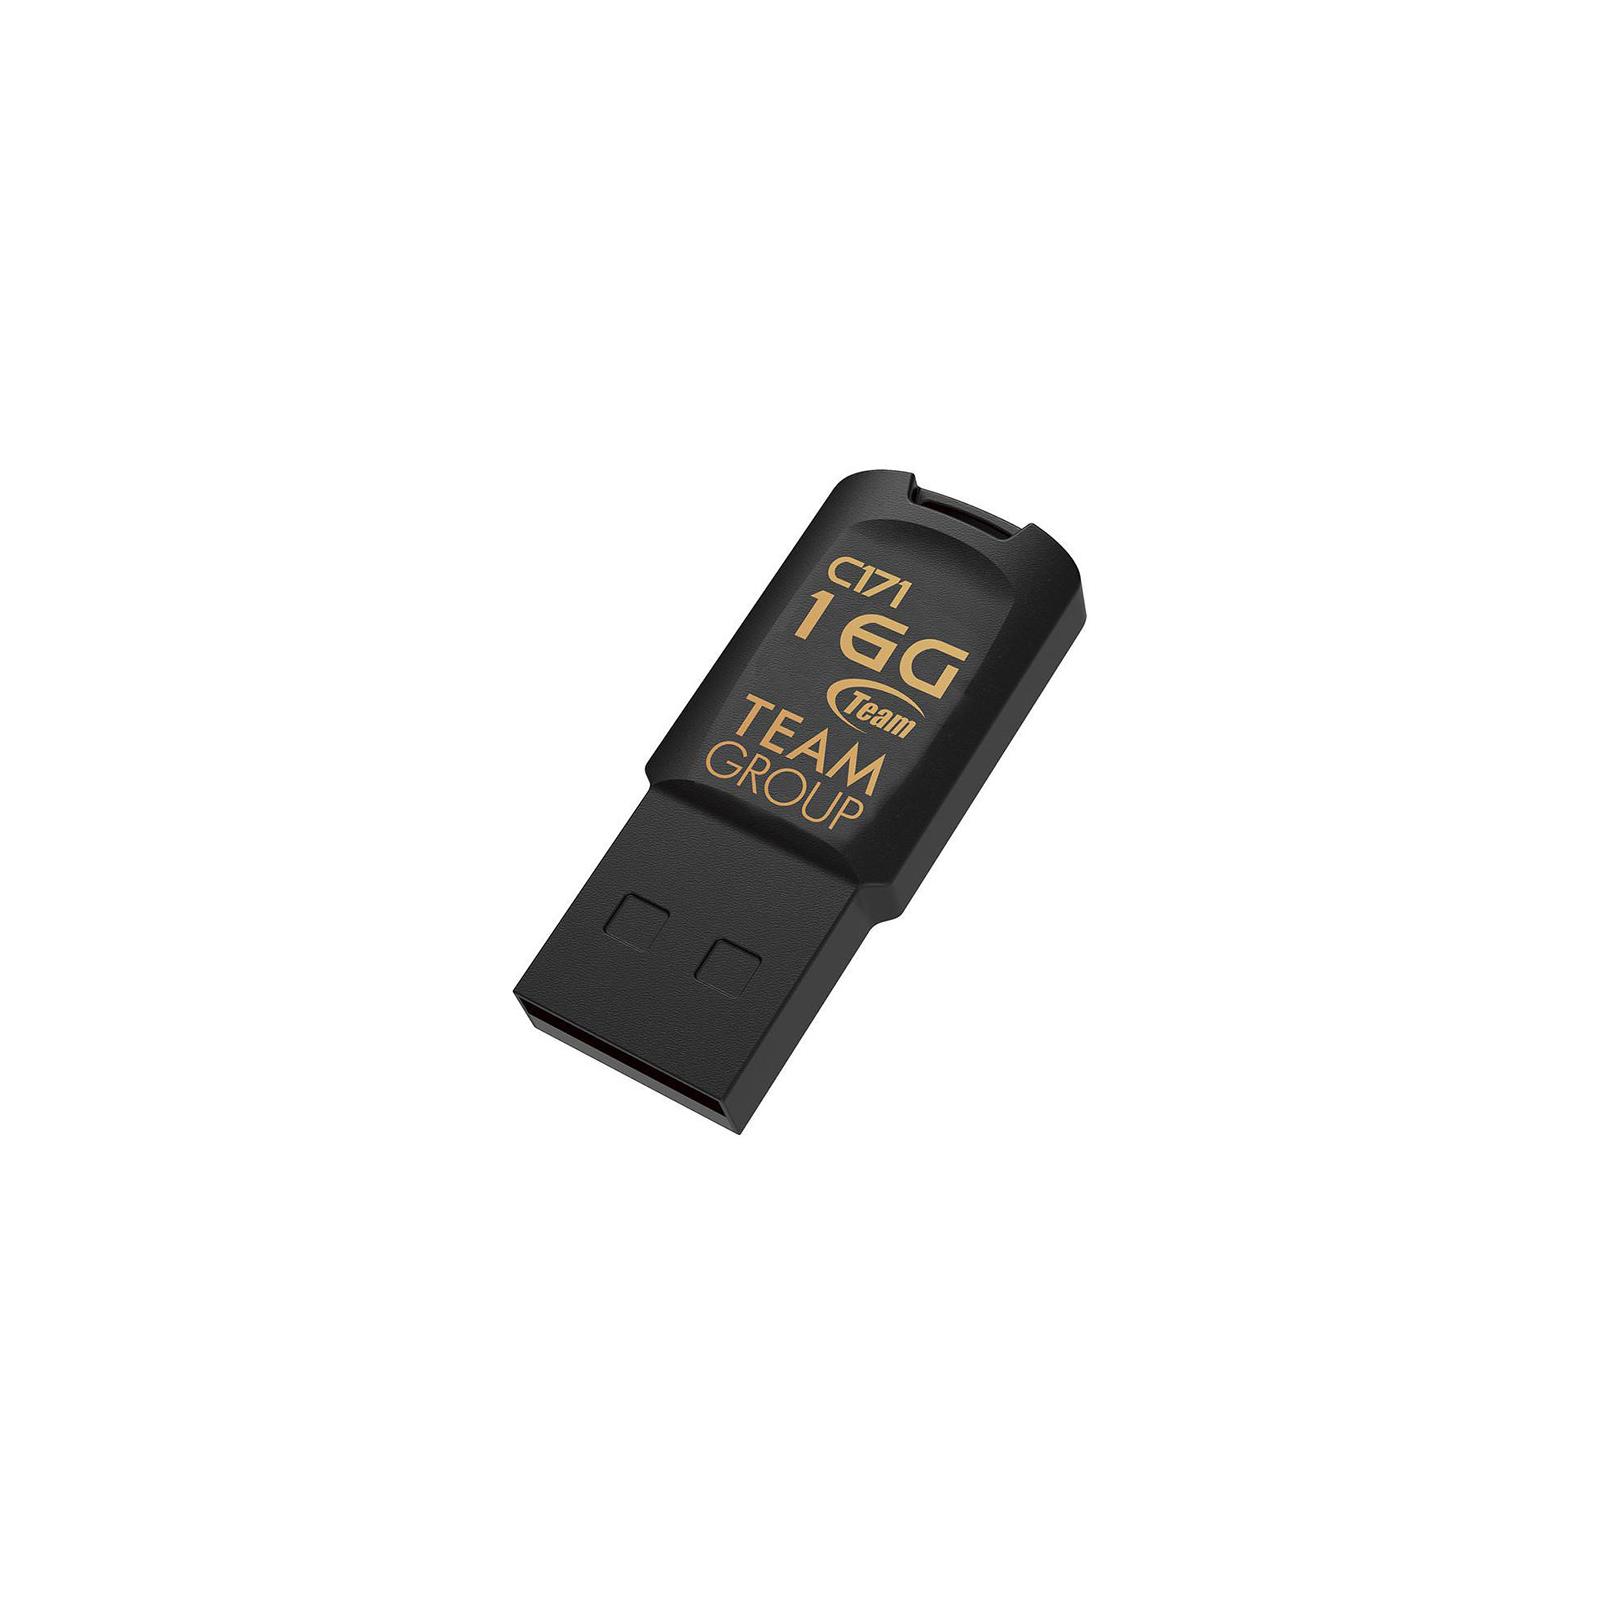 USB флеш накопитель Team 32GB C171 Black USB 2.0 (TC17132GB01) изображение 2